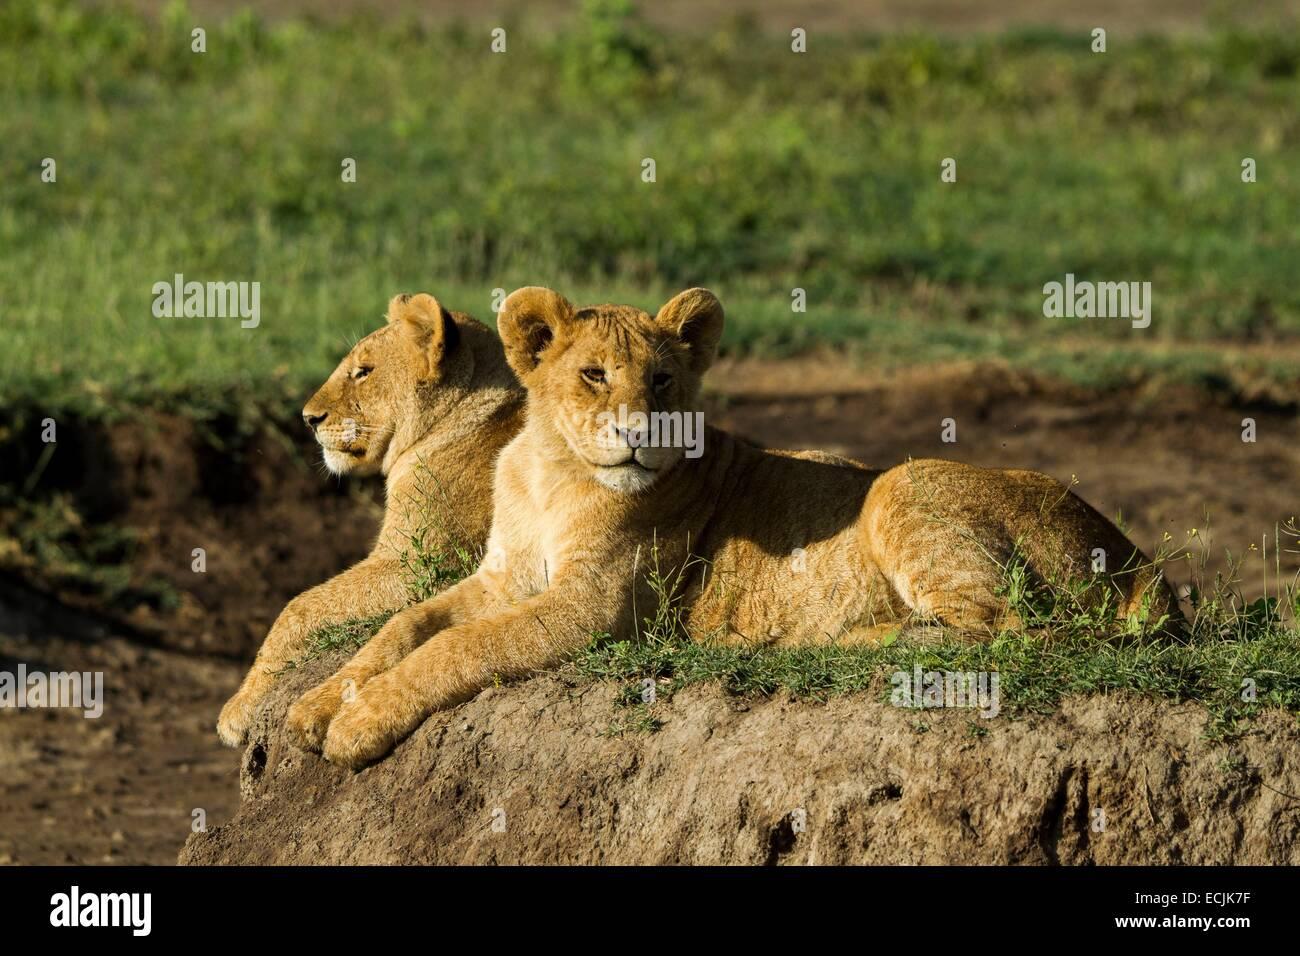 Tanzanie, Ngorongoro national park, lion (Panthera leo), big cubs - Stock Image